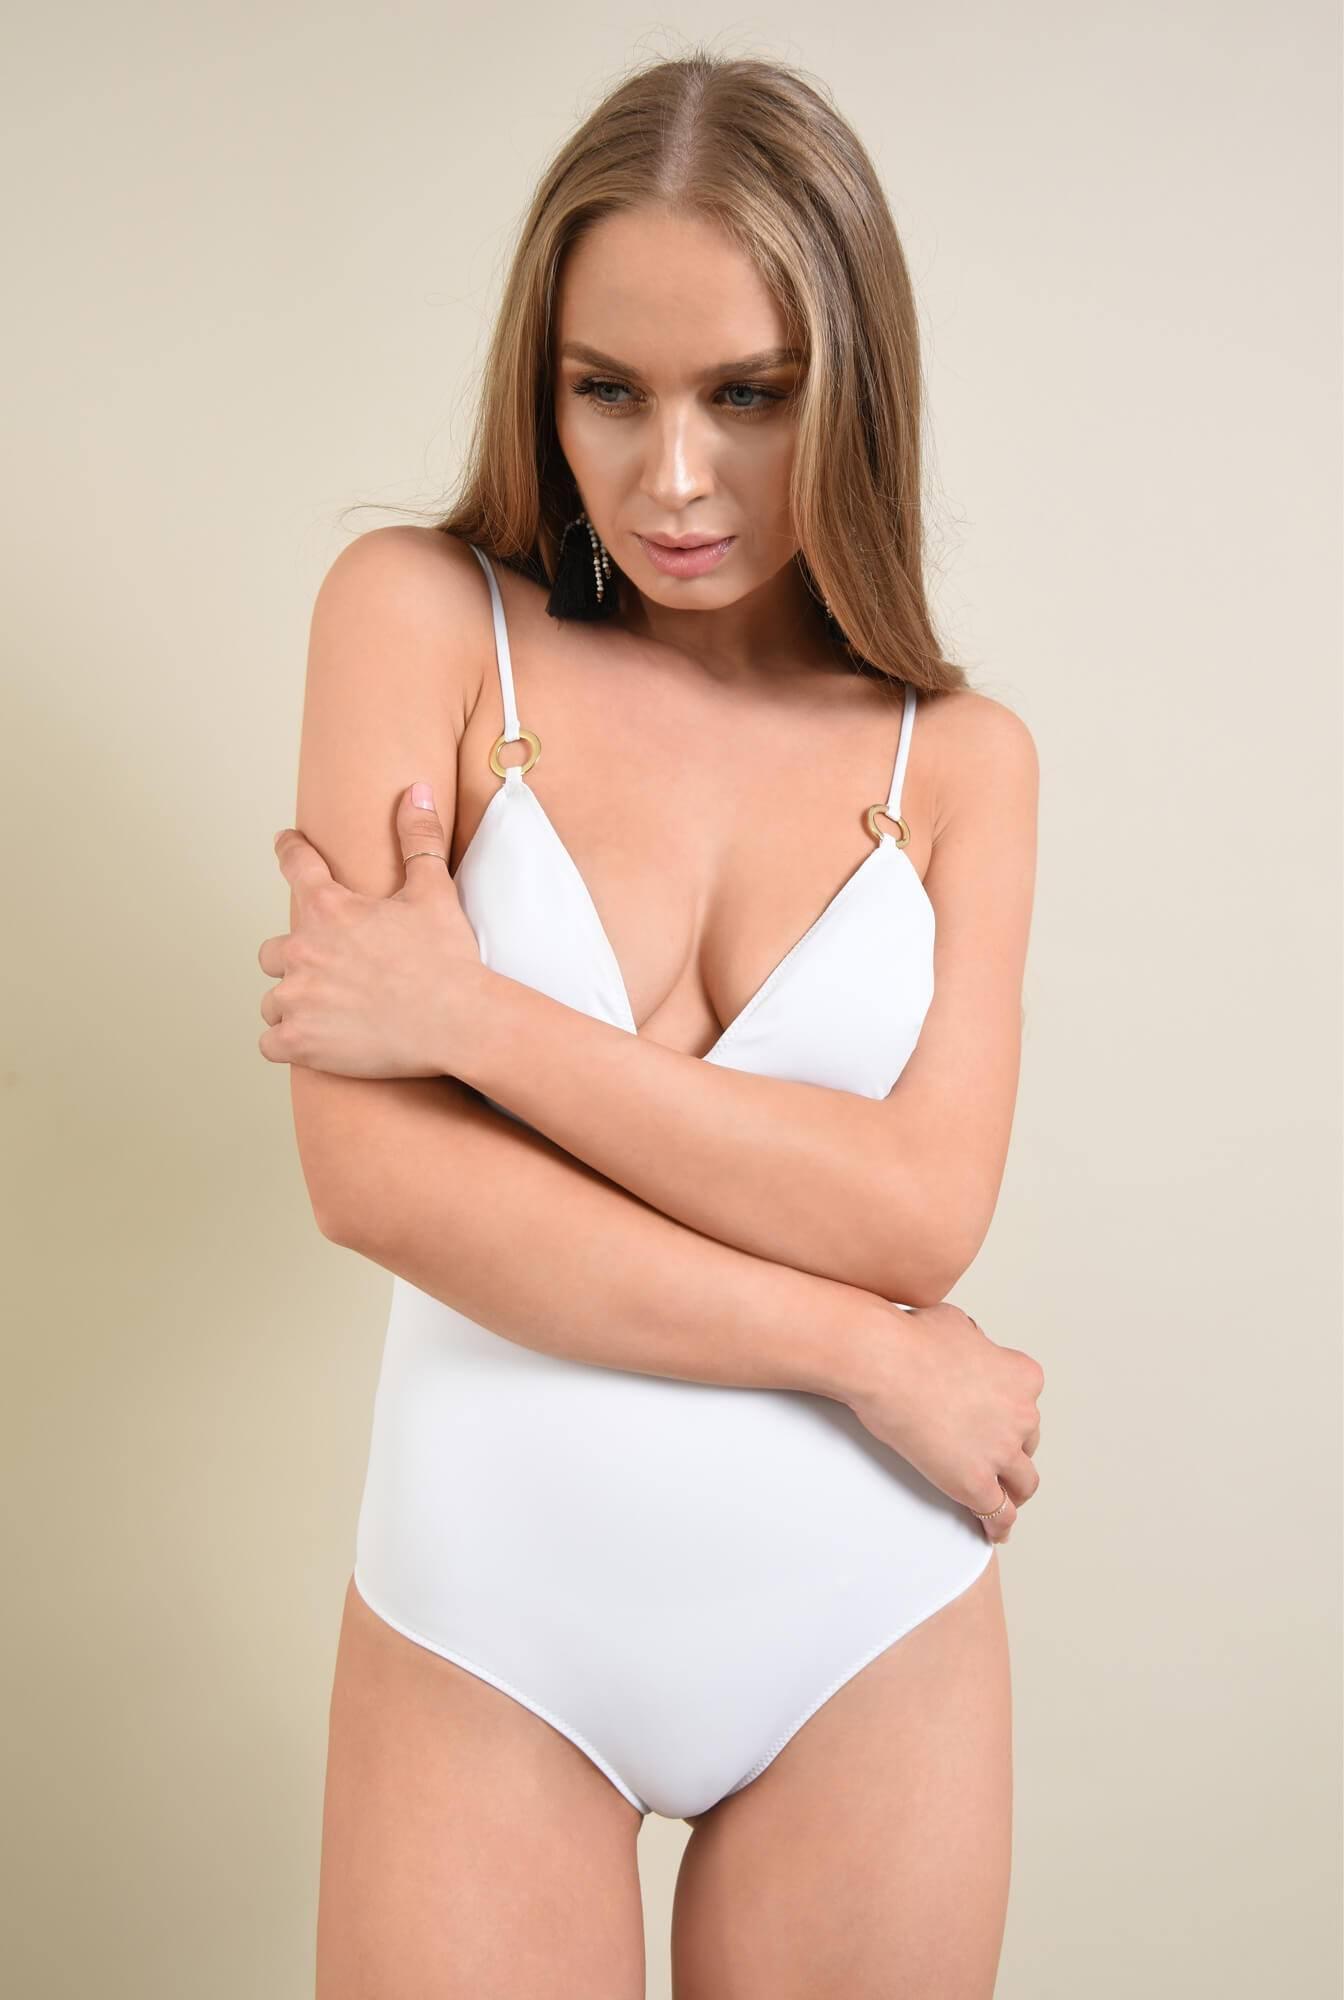 2 - costum de baie intreg, alb, decoltat